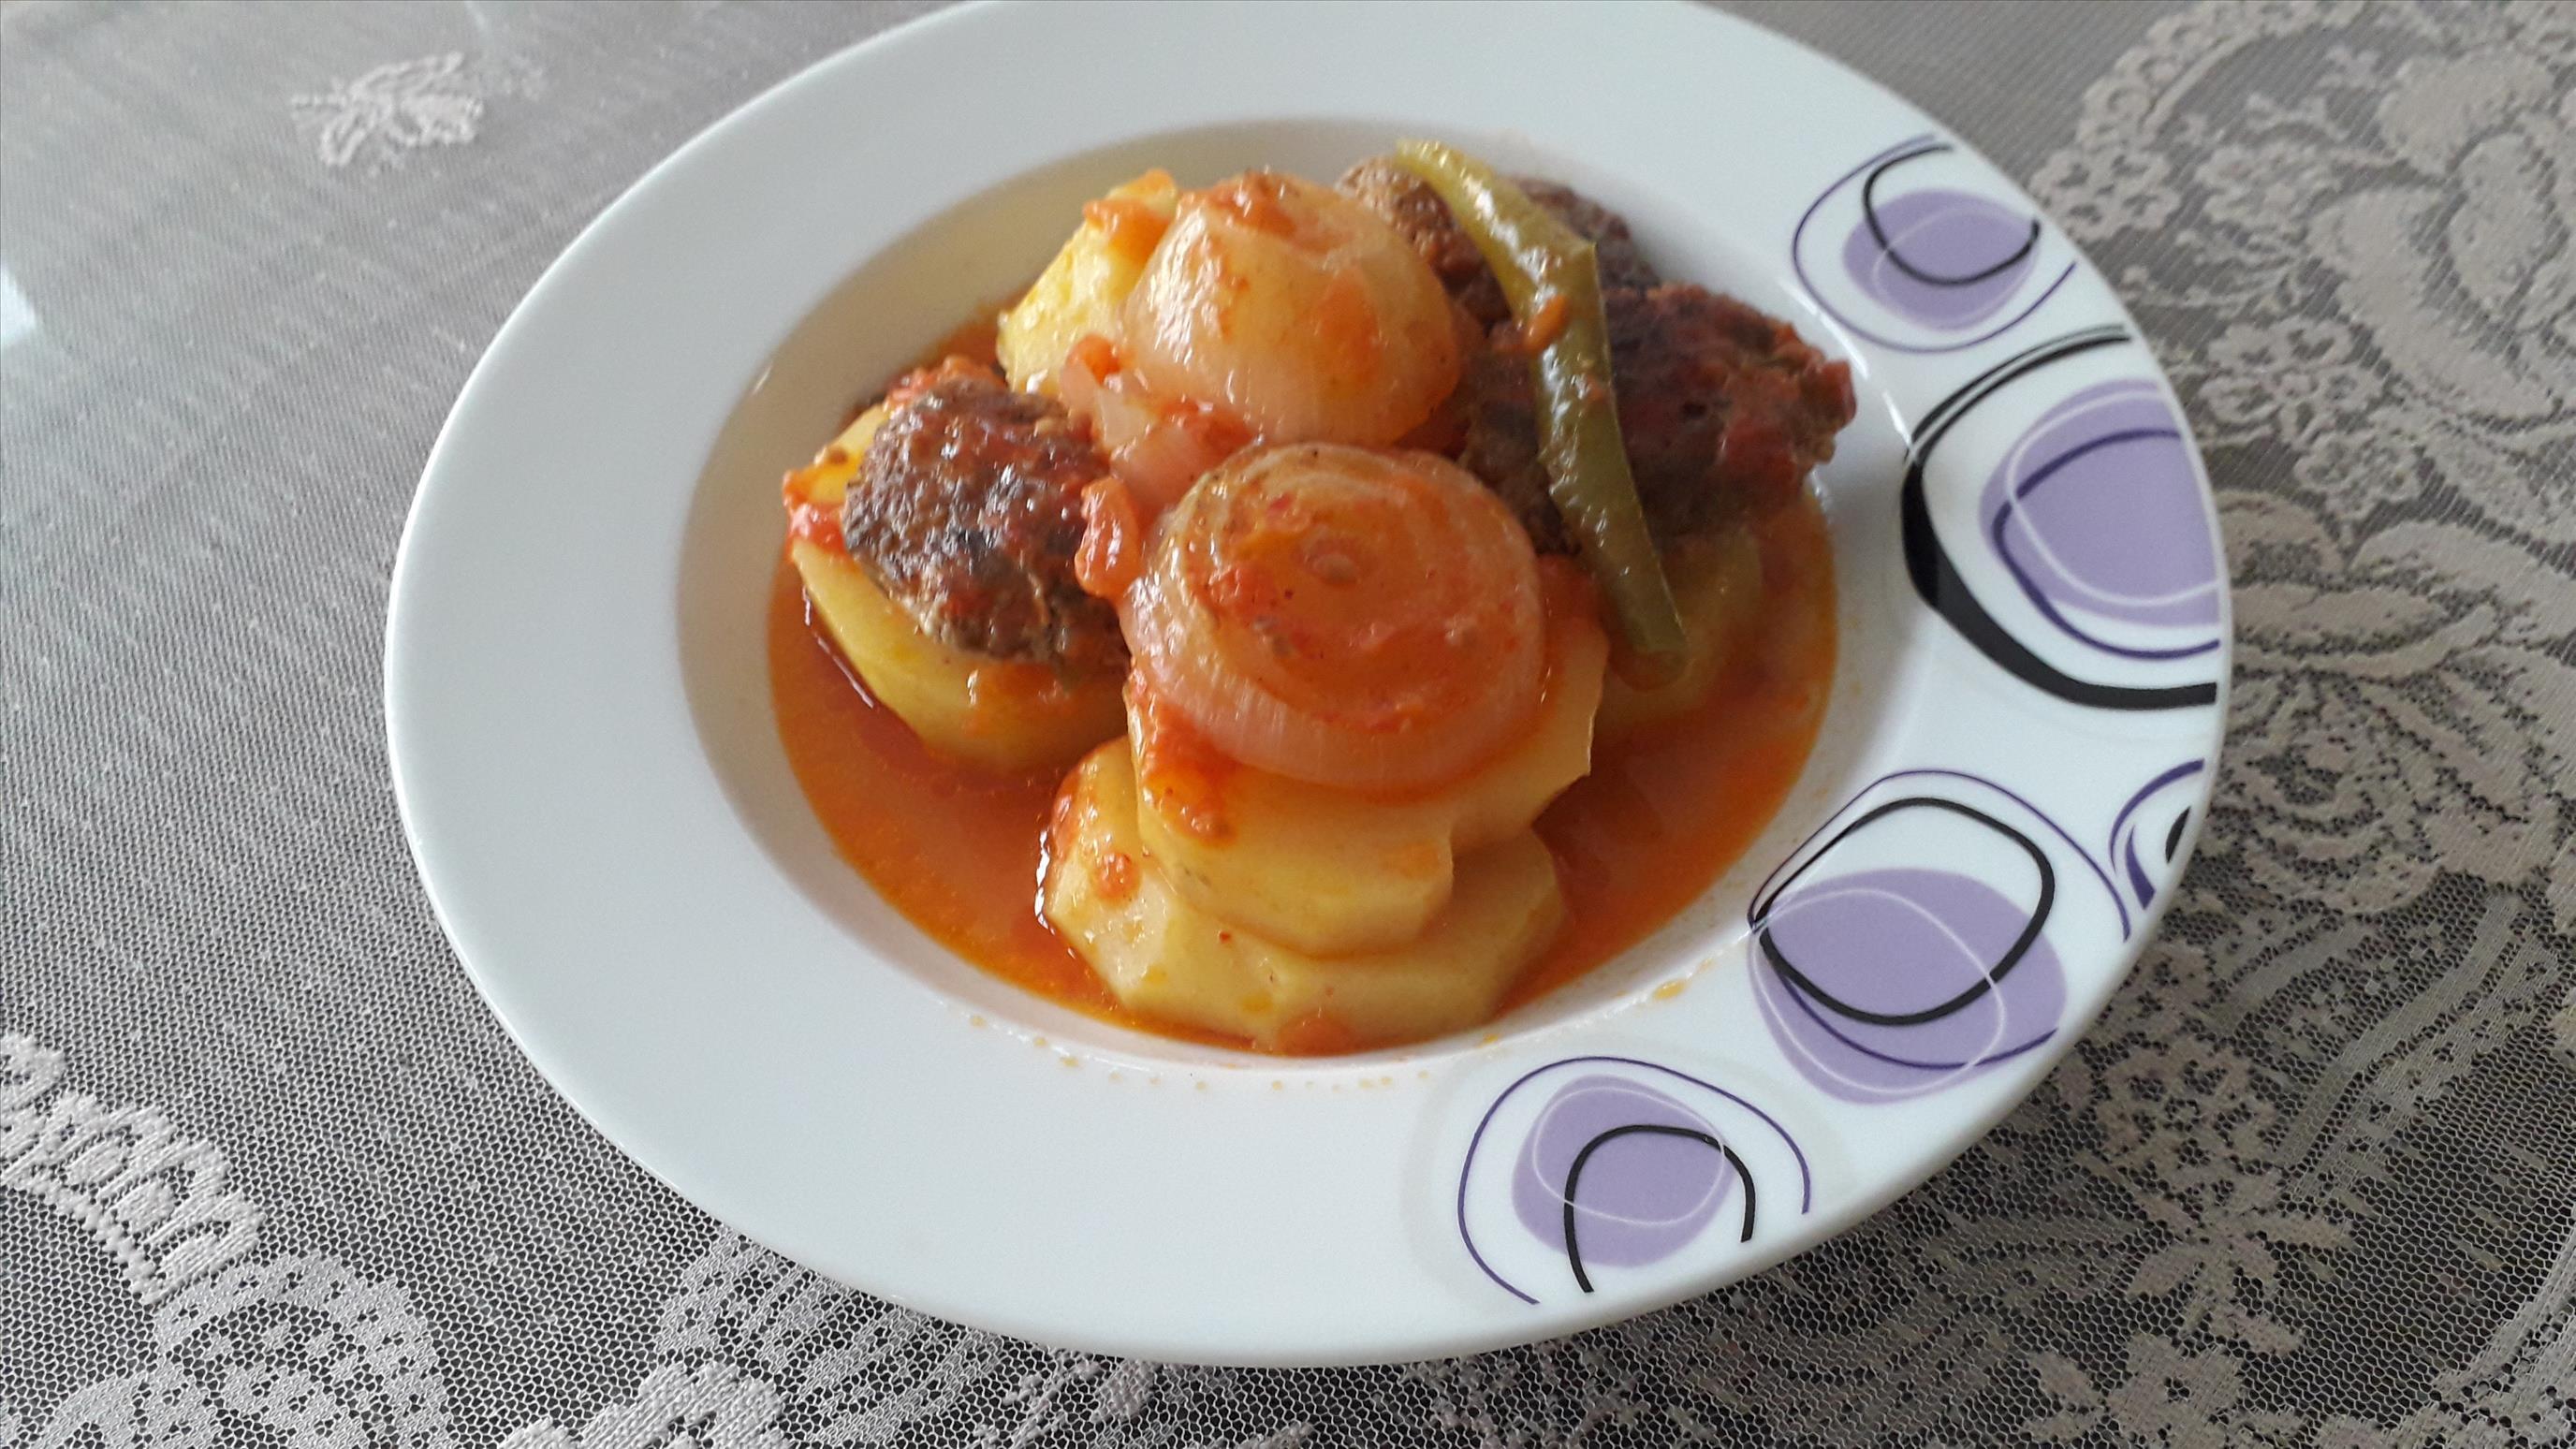 Soğanlı, Köfteli Patates Kebap